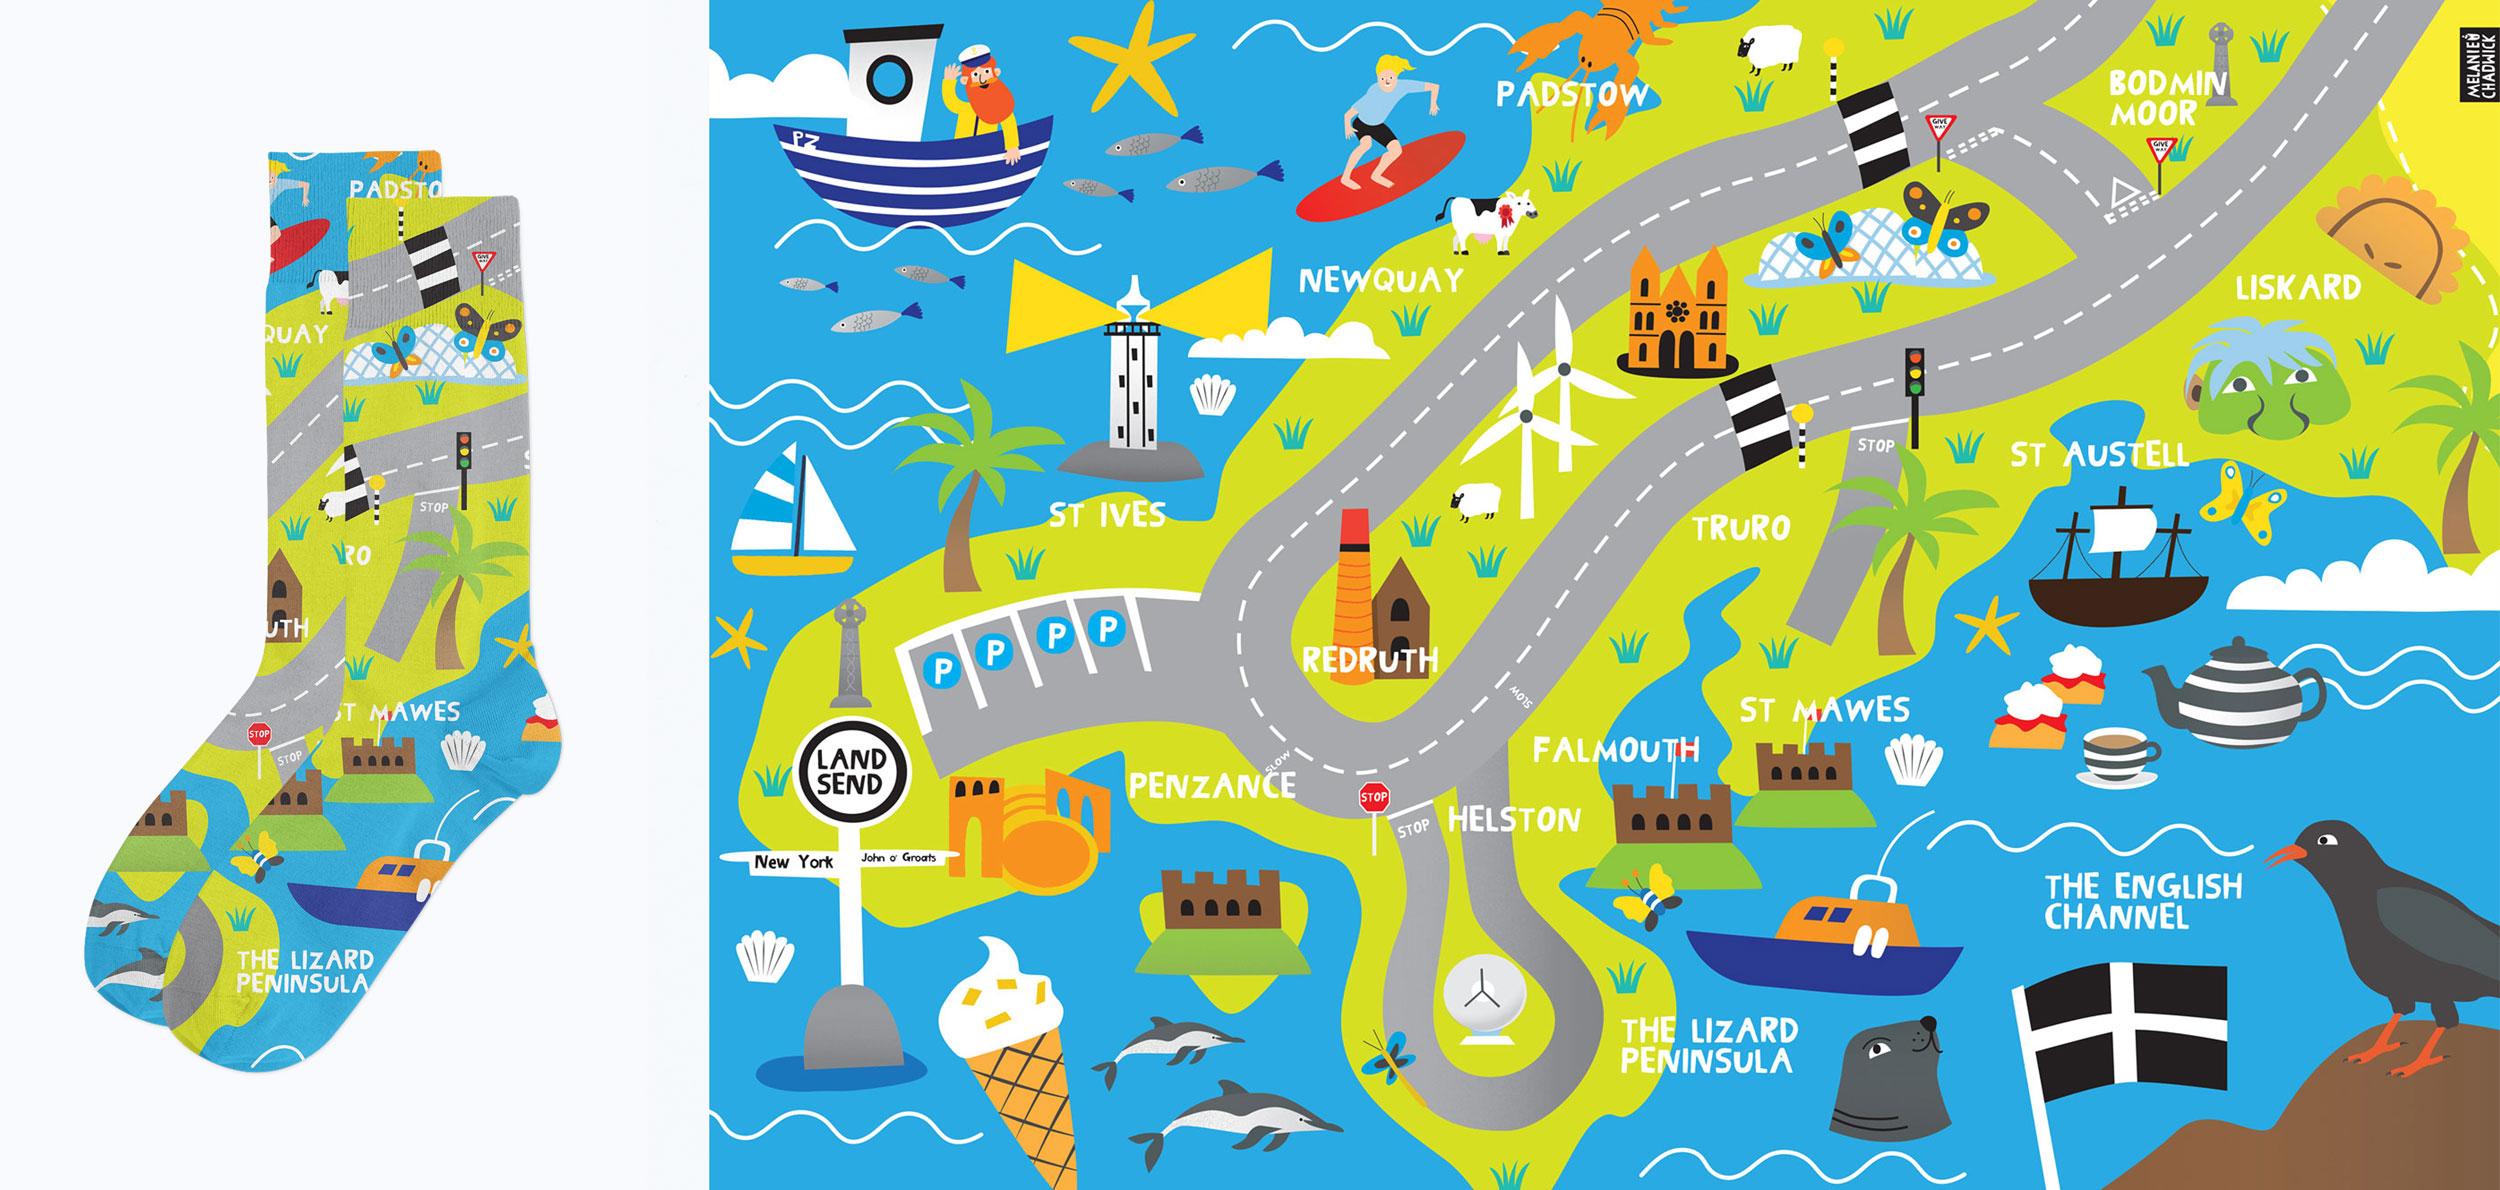 Socks-cornwall-map-illustration-Melanie-Chadwick